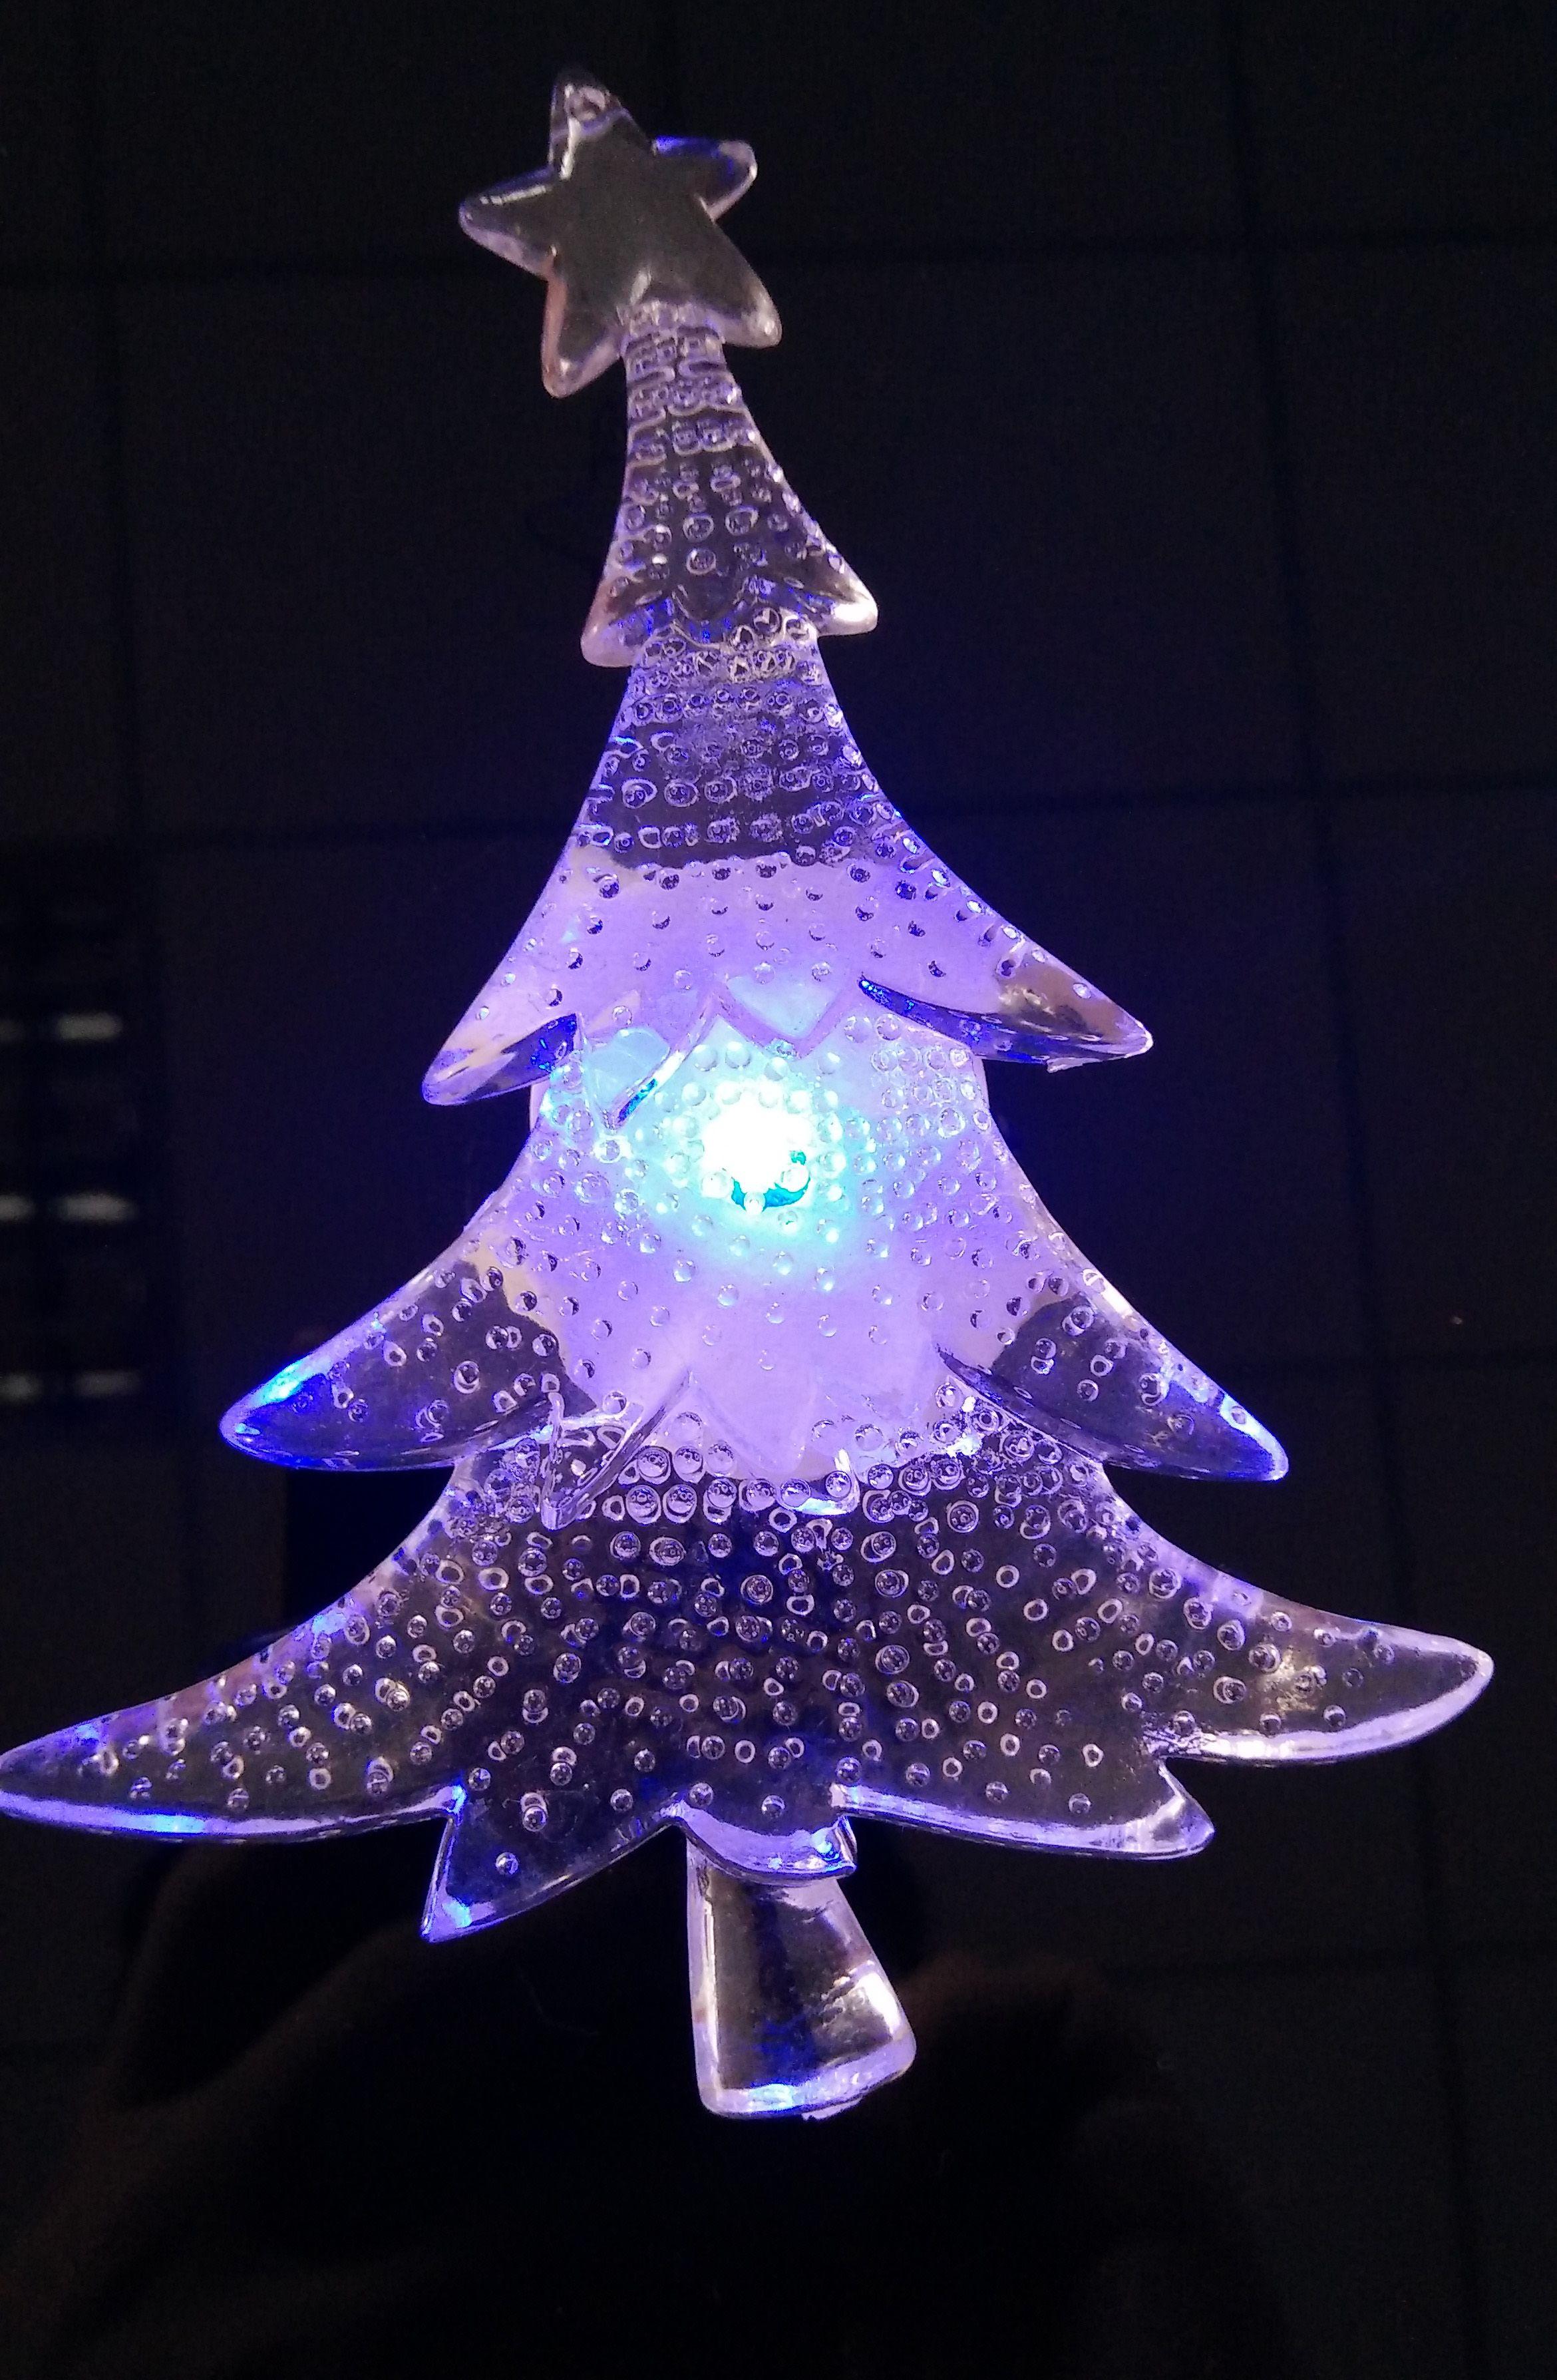 Pink Christmas Lights.New Brand Led Window Suction Christmas Tree Table Decoration Light Christmas Ornaments Acrylic Fascinating Tree Drop Shipping Pink Christmas